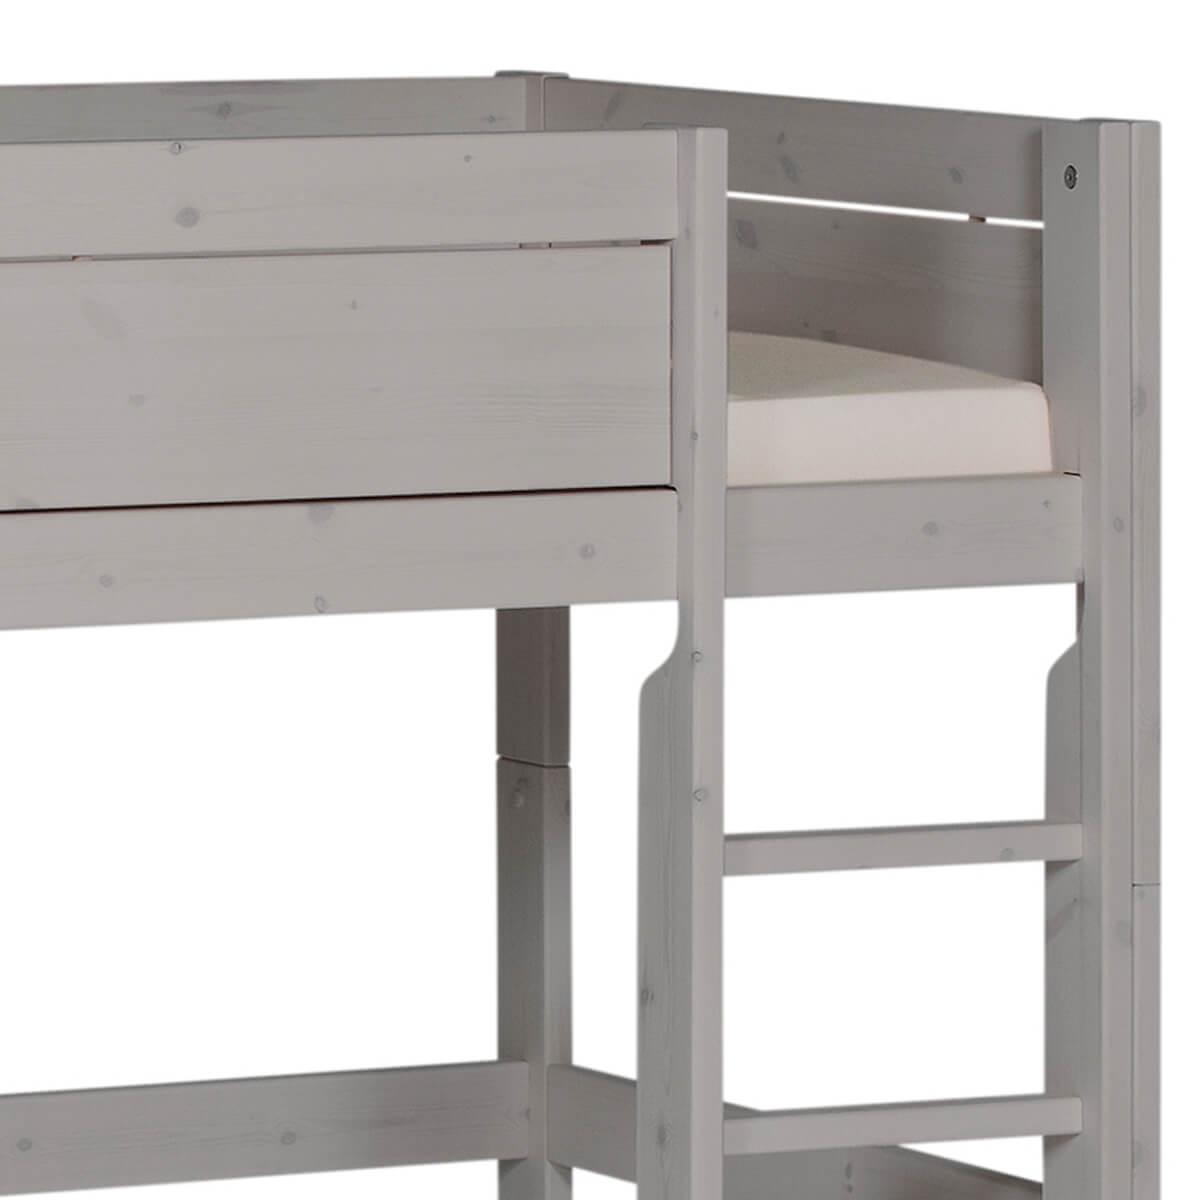 Cama media alta 90x200cm escalera recta Lifetime grey washed